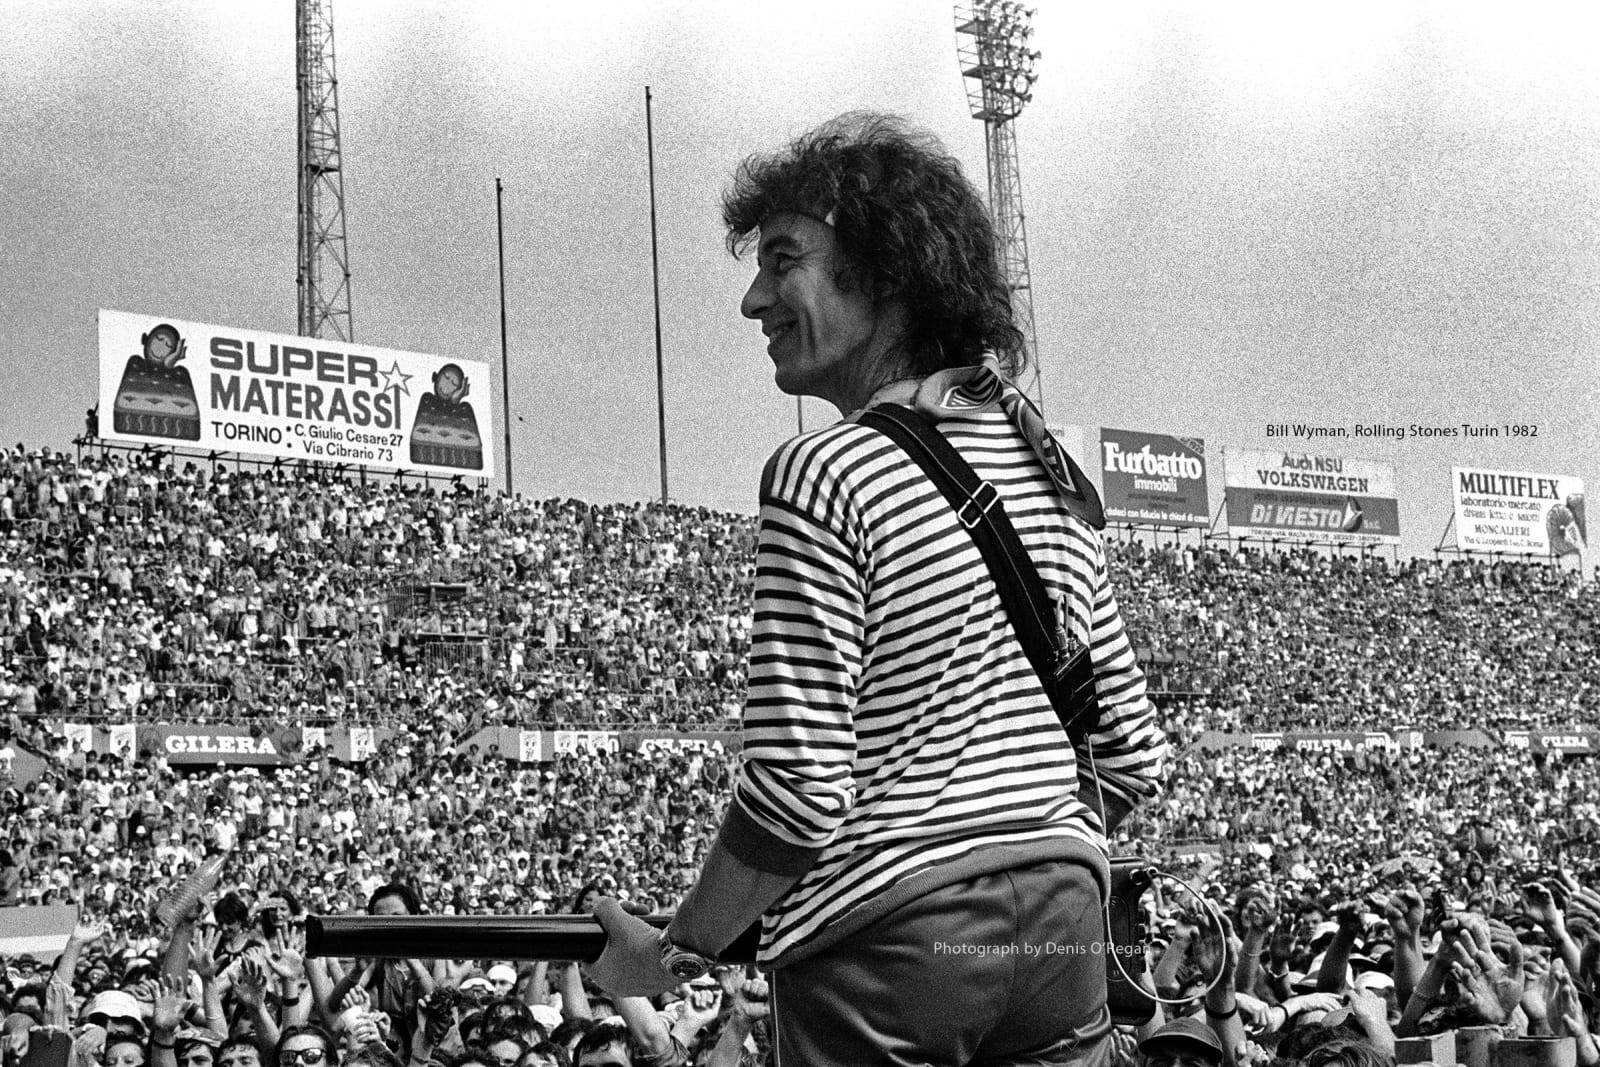 ROLLING STONES, Bill Wyman Turin Italy, 1982